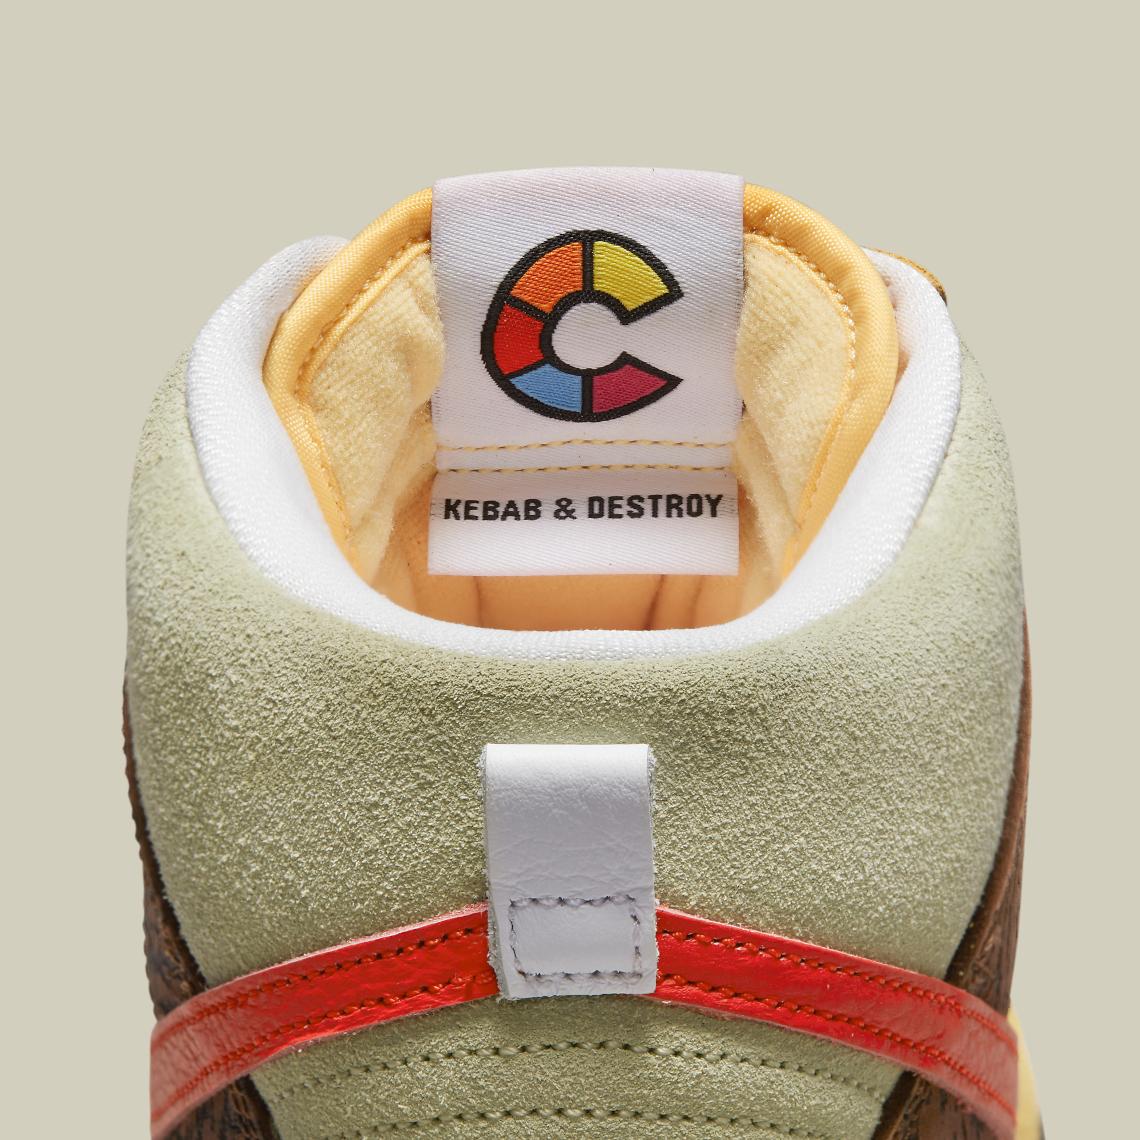 Nike-SB-Dunk-High-CZ2205-700-Color-Skates-CZ2205-700-2.jpg?w=1140